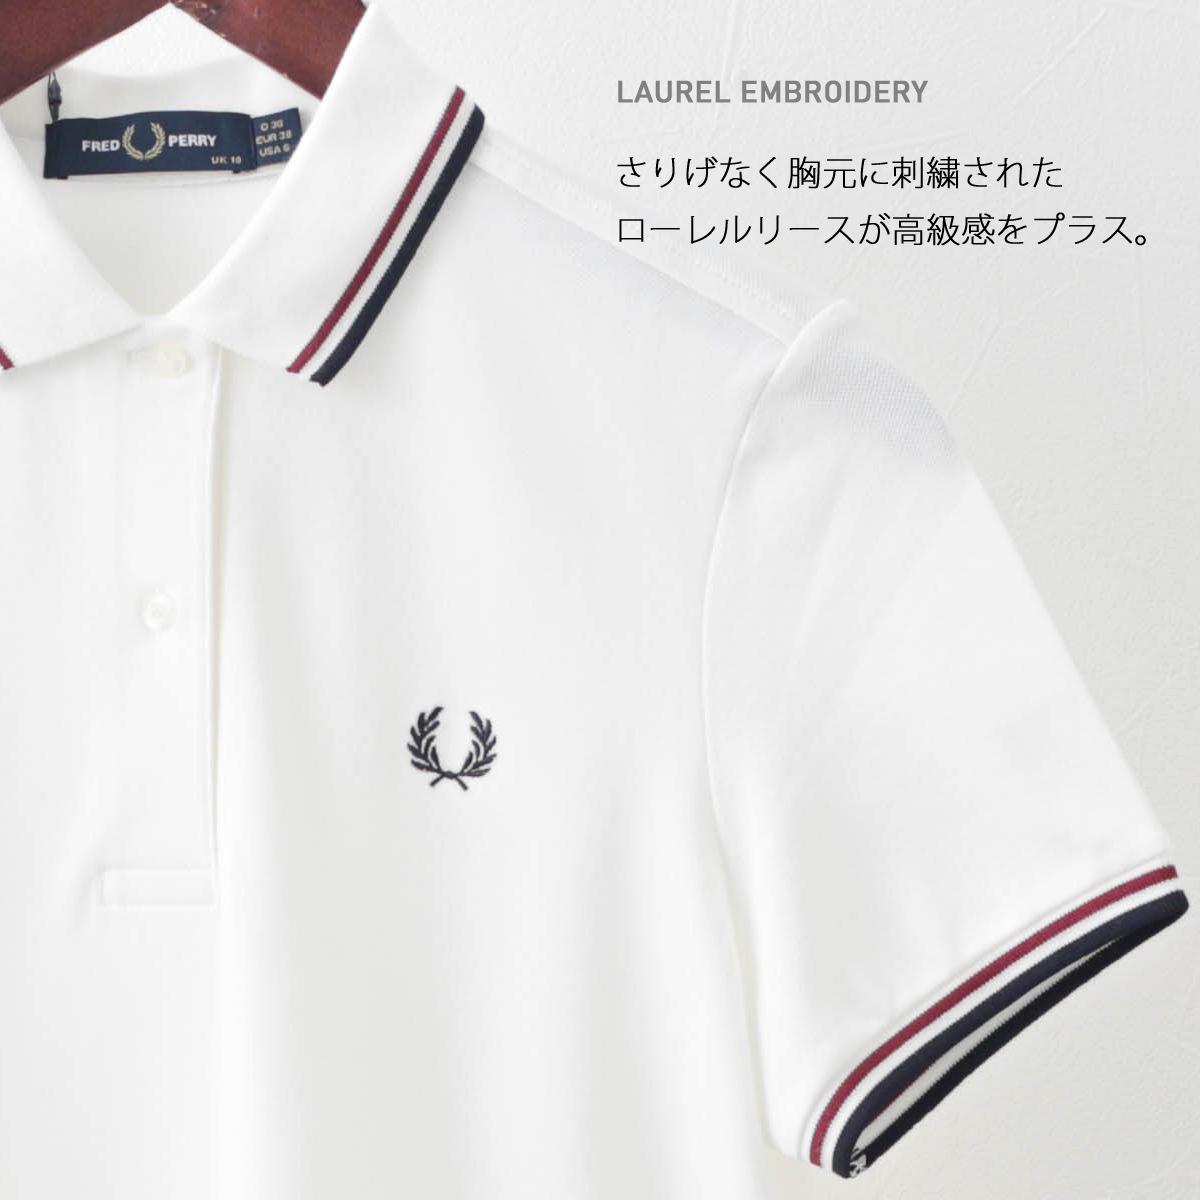 Fred Perry フレッドペリー レディース ポロシャツ ワンピース 半袖 ティップライン コットン ホワイト ブラック 2色 プレッピー 正規販売店